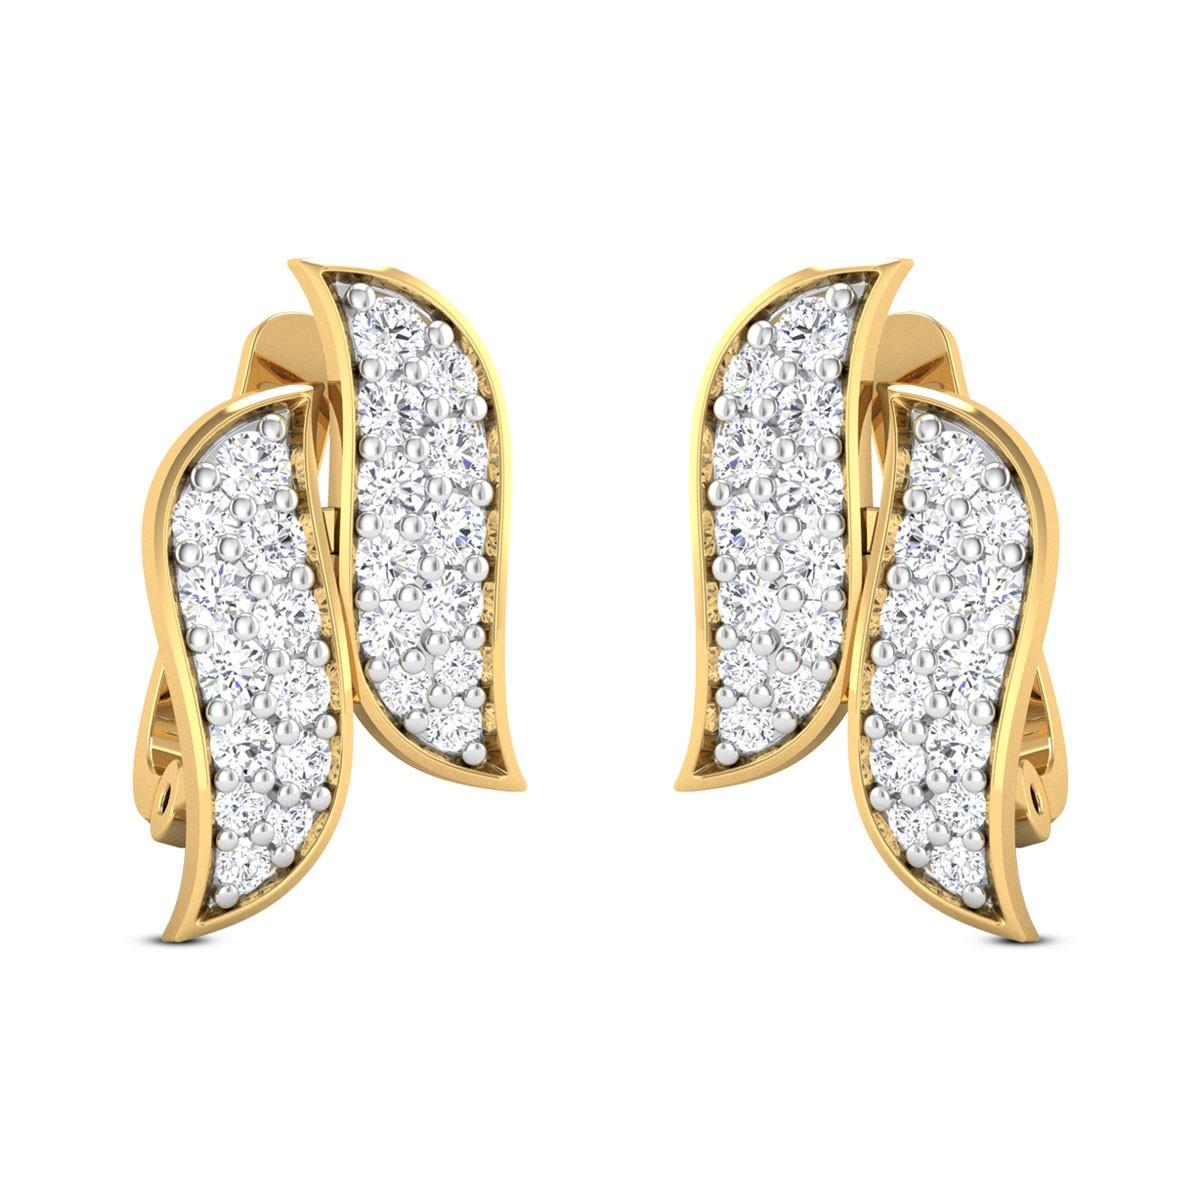 Sonatina Diamond Earrings